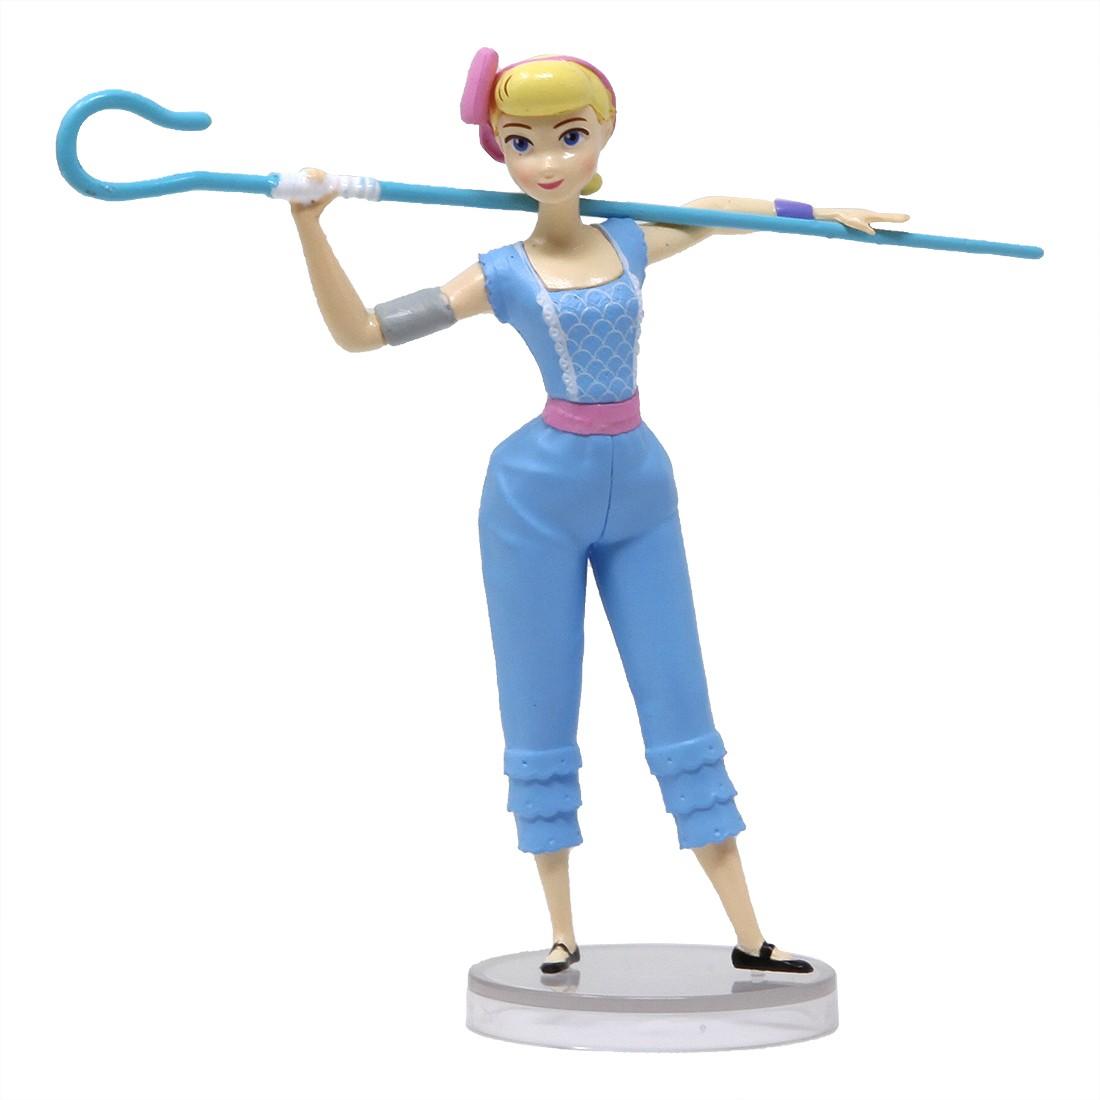 Medicom UDF Toy Story 4 Bo Beep Ultra Detail Figure (blue)